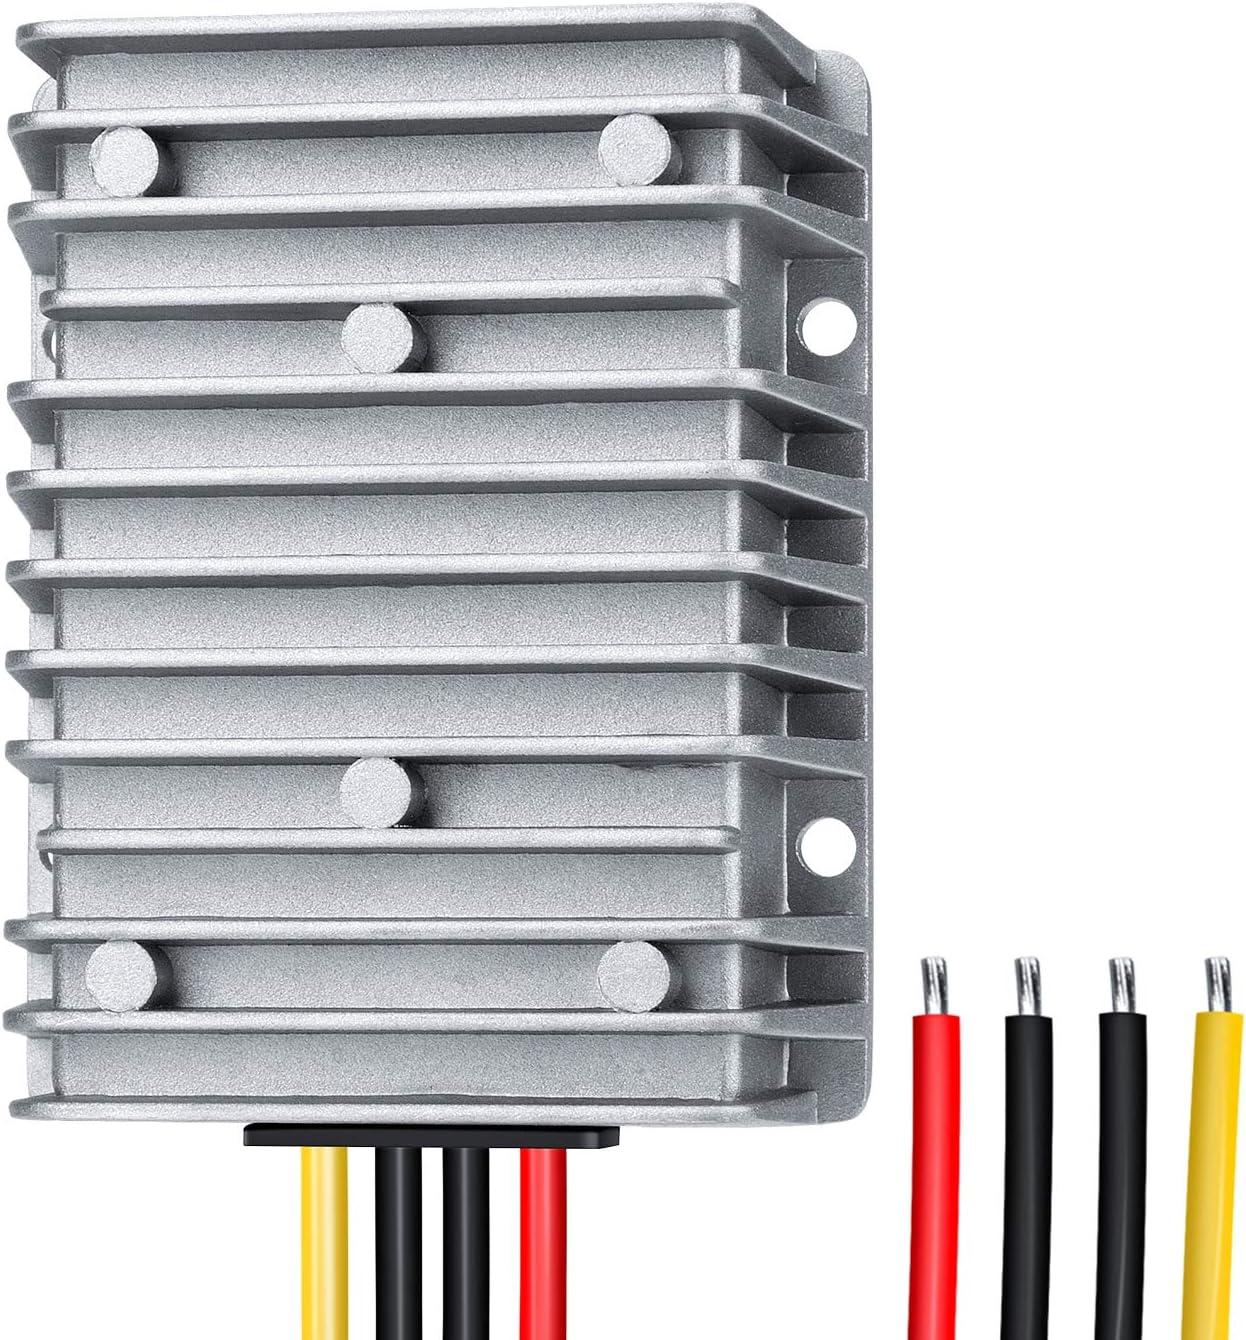 DC9-24V to DC 450V converter 20W boost step up switching power supply regulator